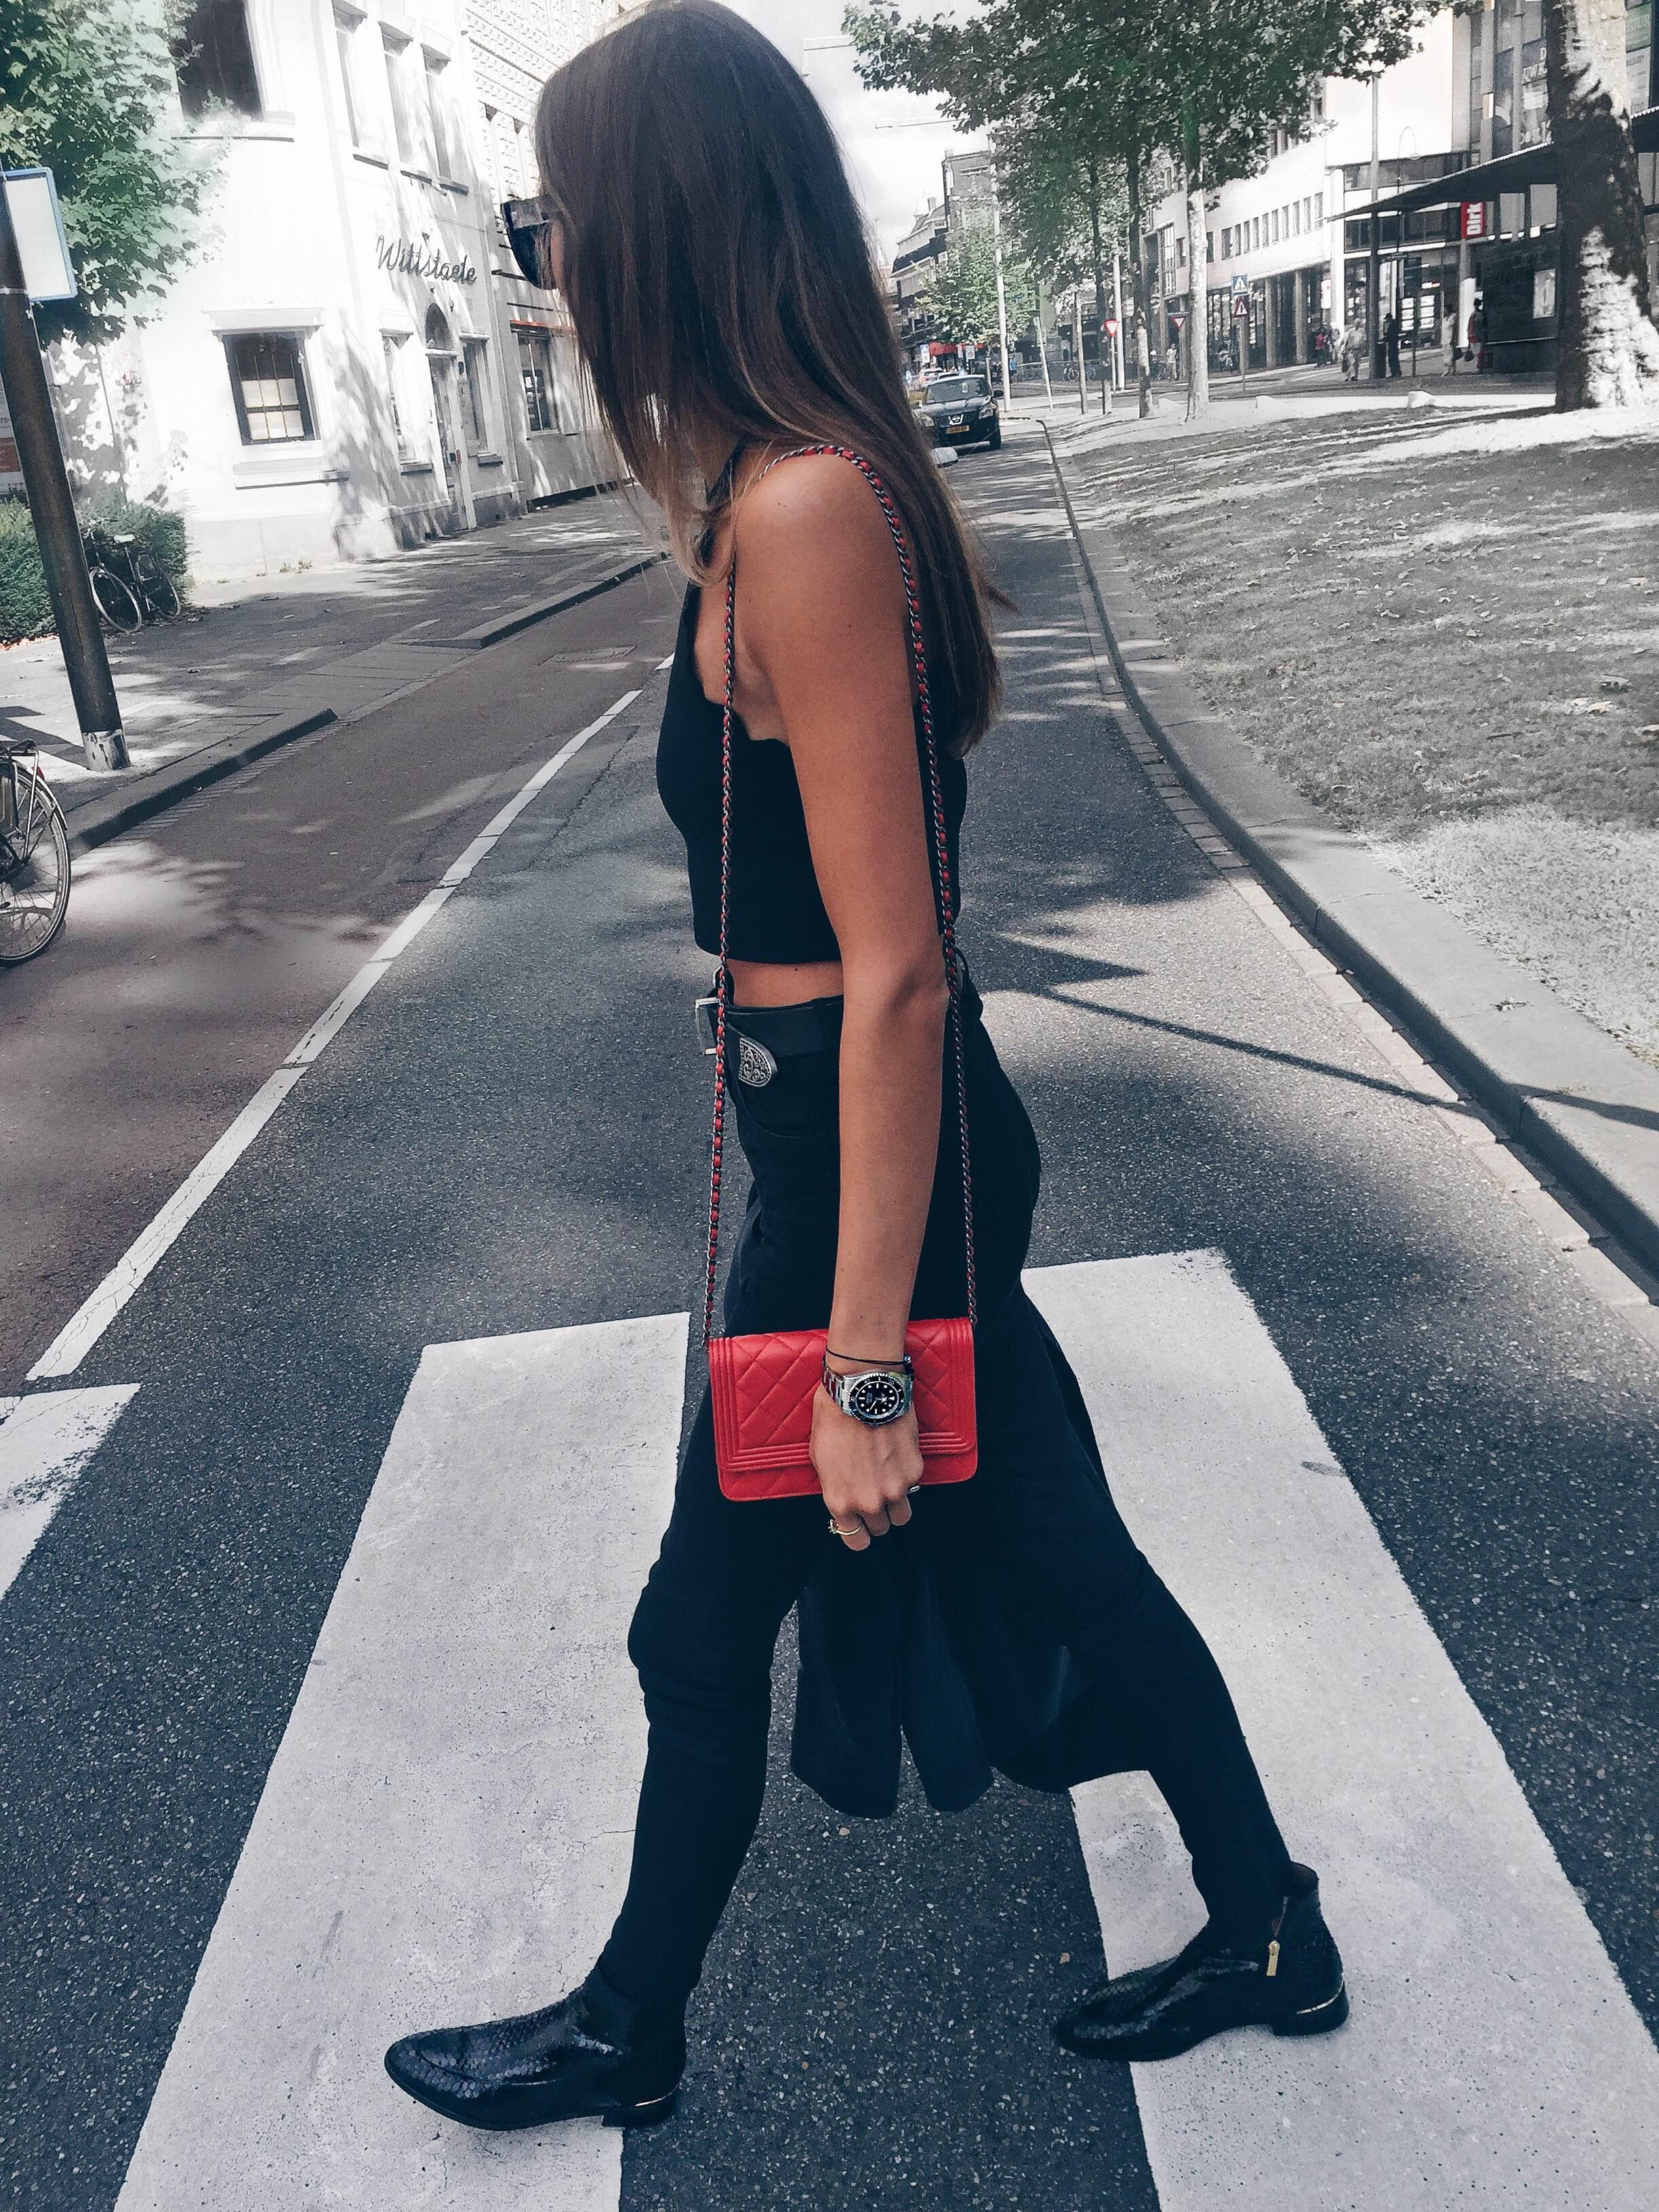 linda_tsetis_worlds_affair_ootd_black_outfit_1